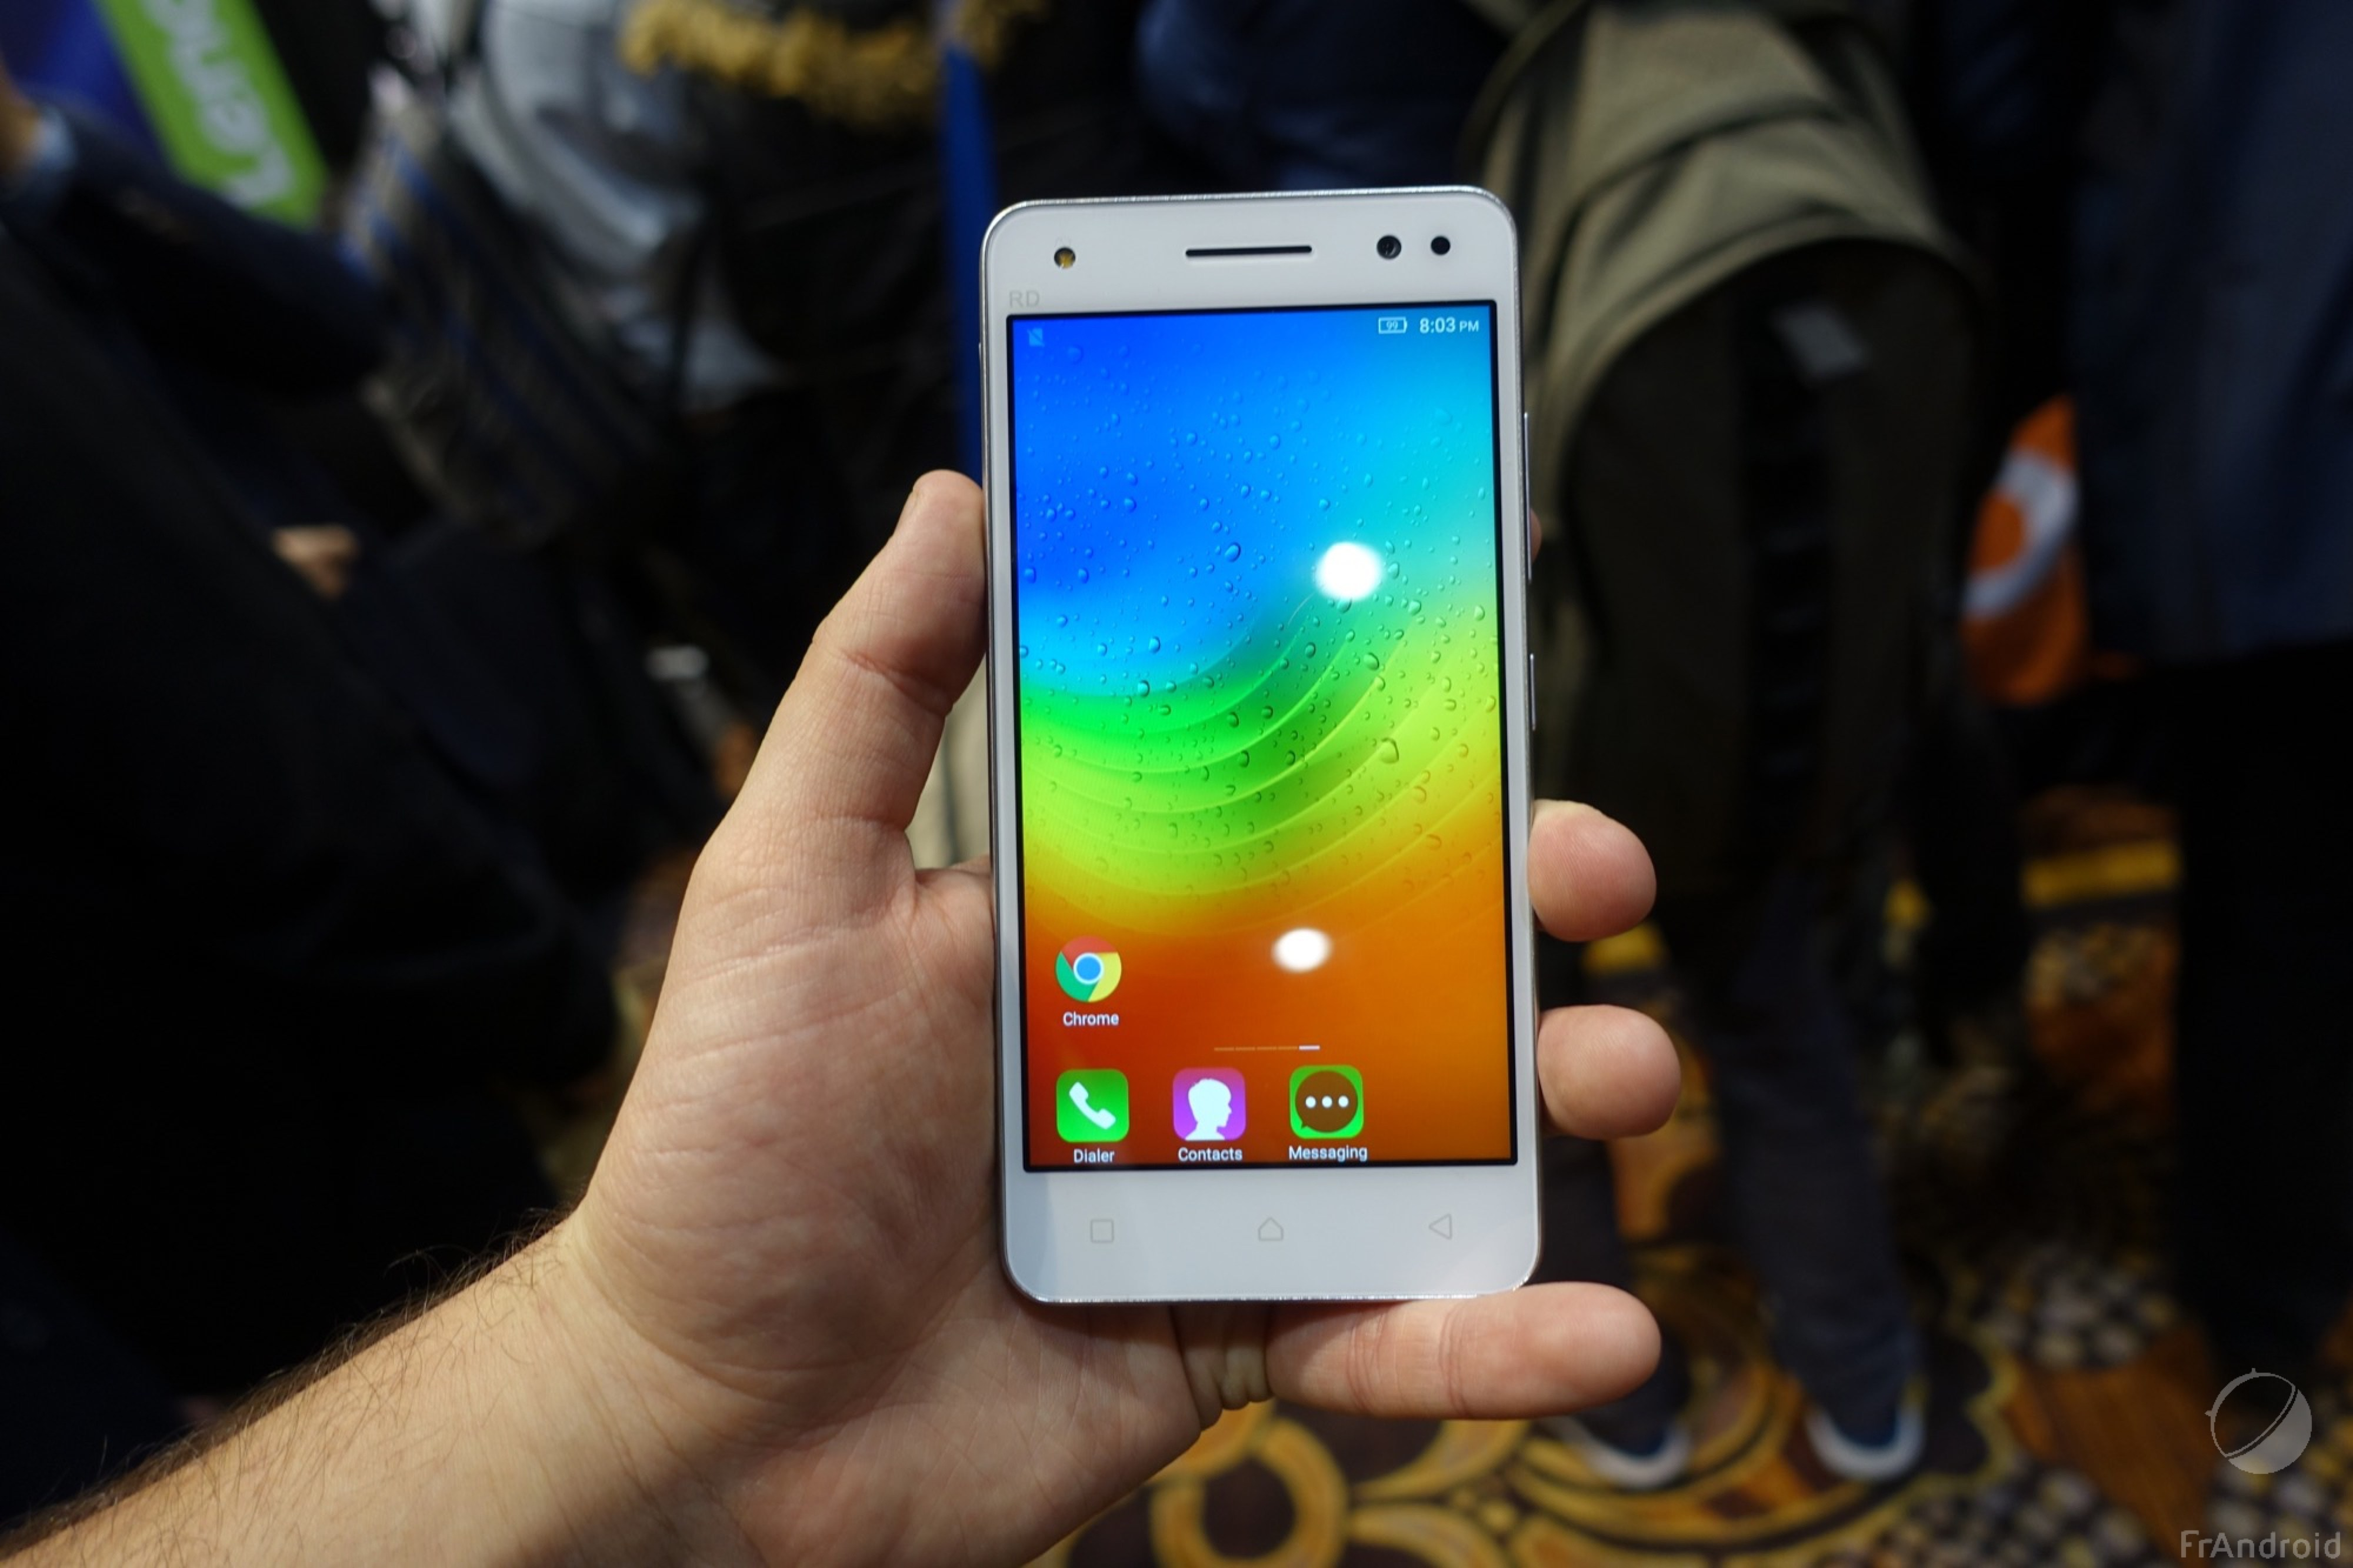 Vidéo : Lenovo Vibe S1 Lite, petit aperçu de ce smartphone Android